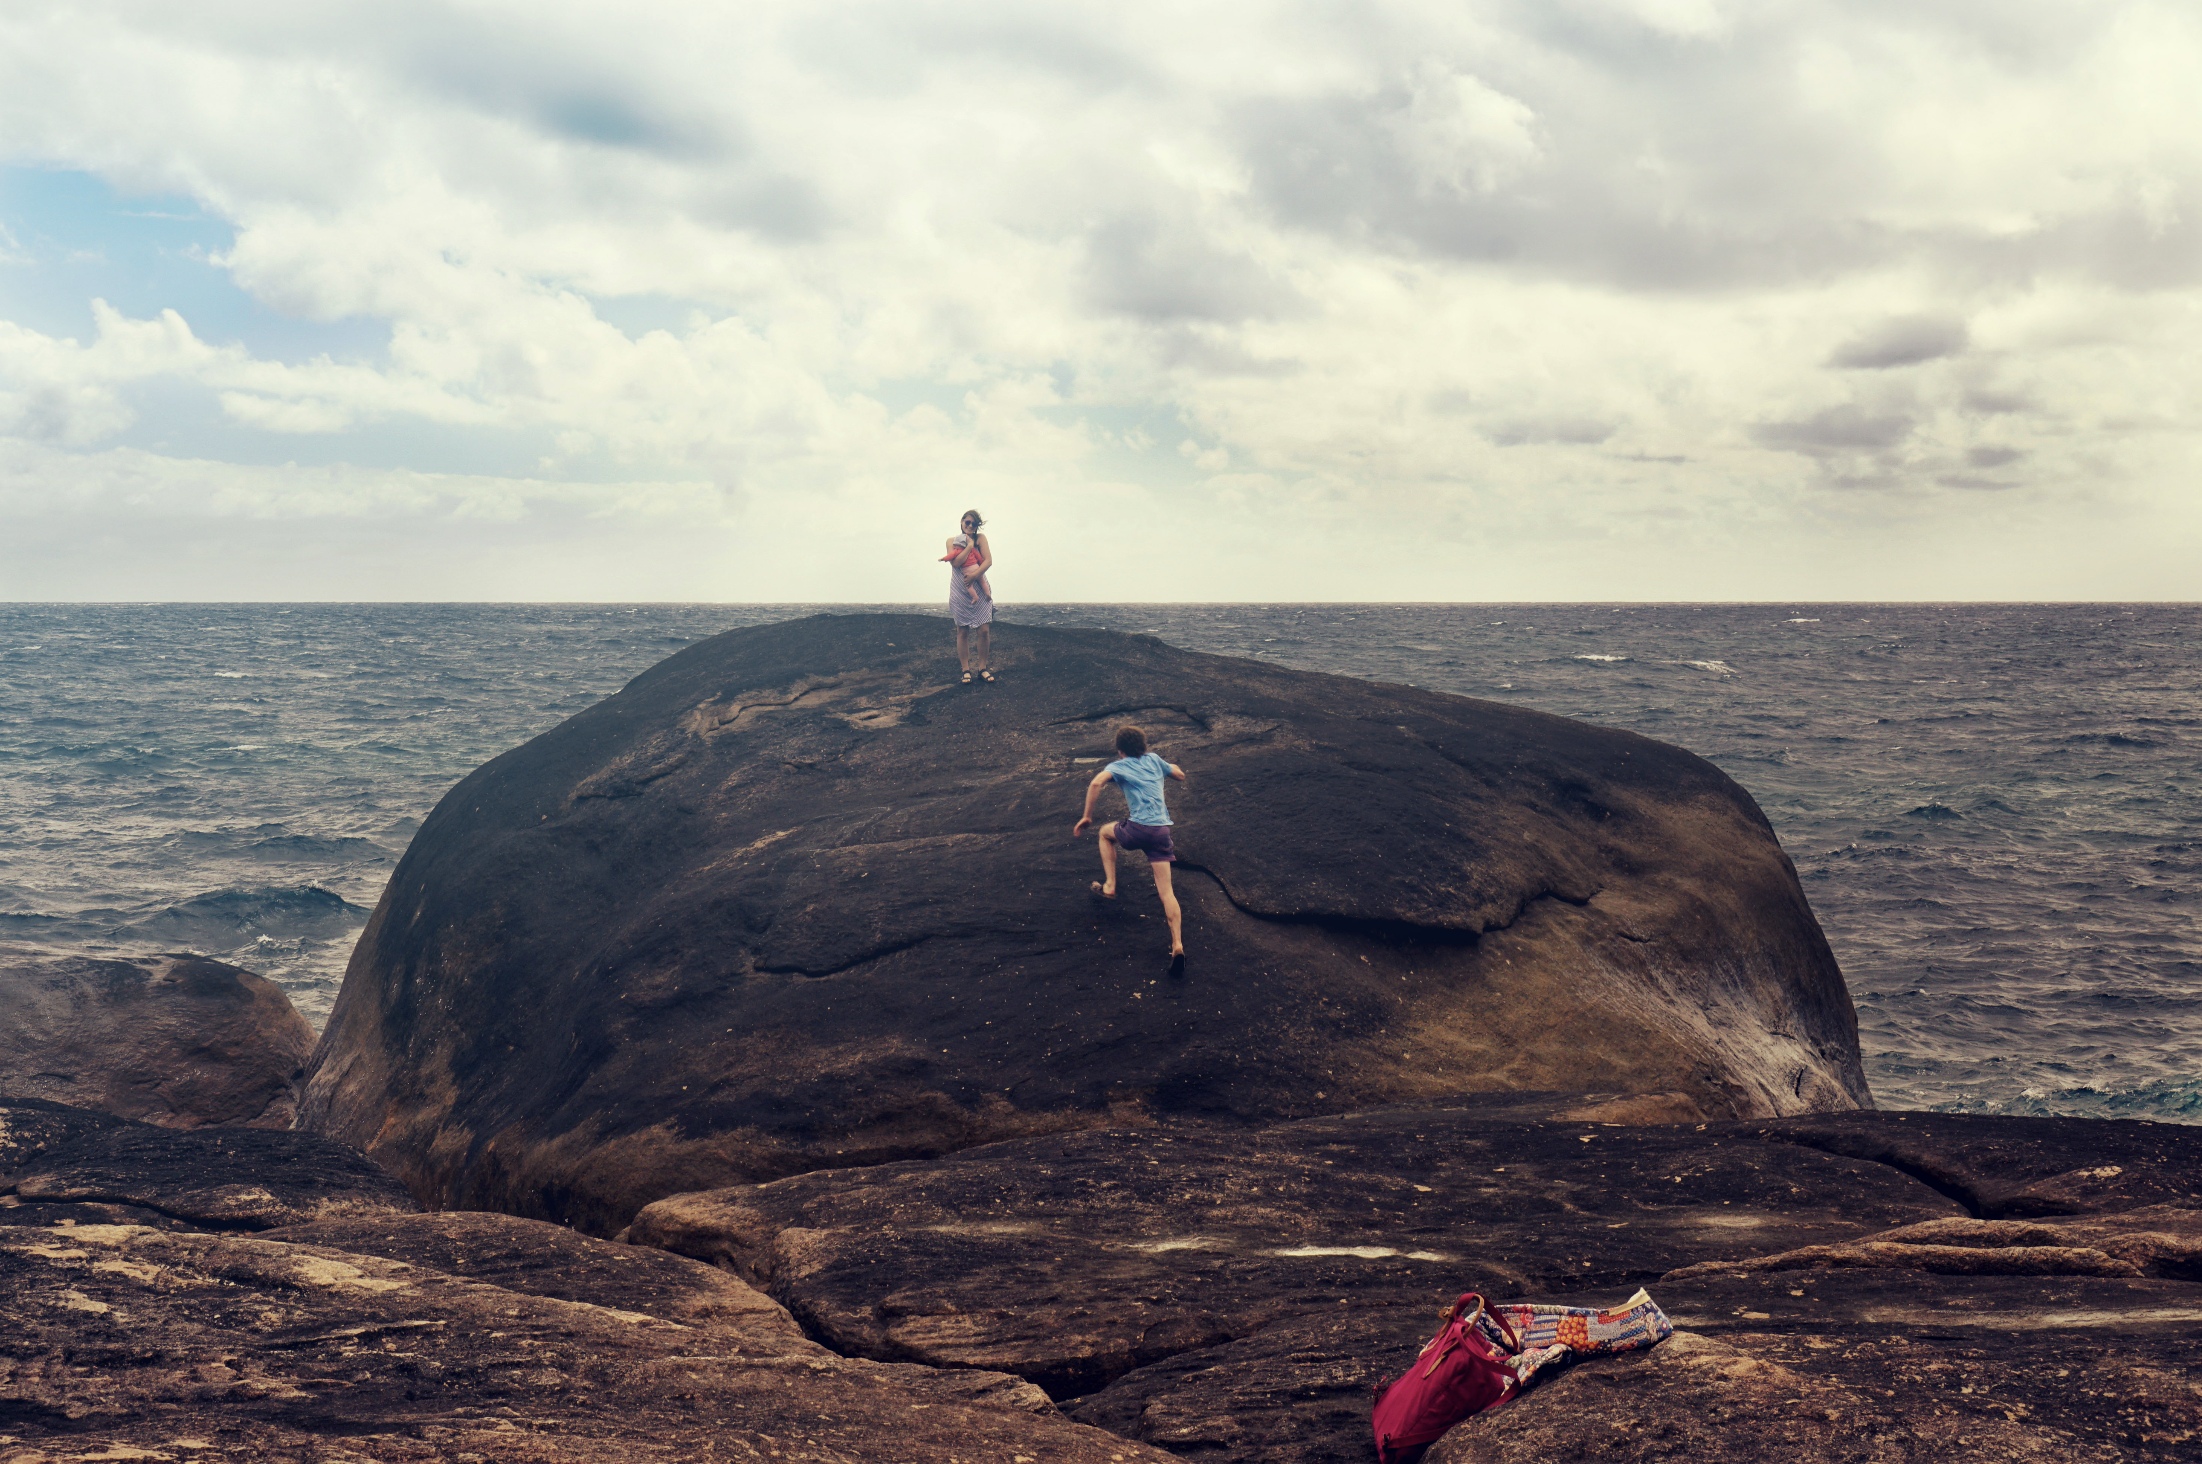 maybeyoulike_bouldering_australia_25